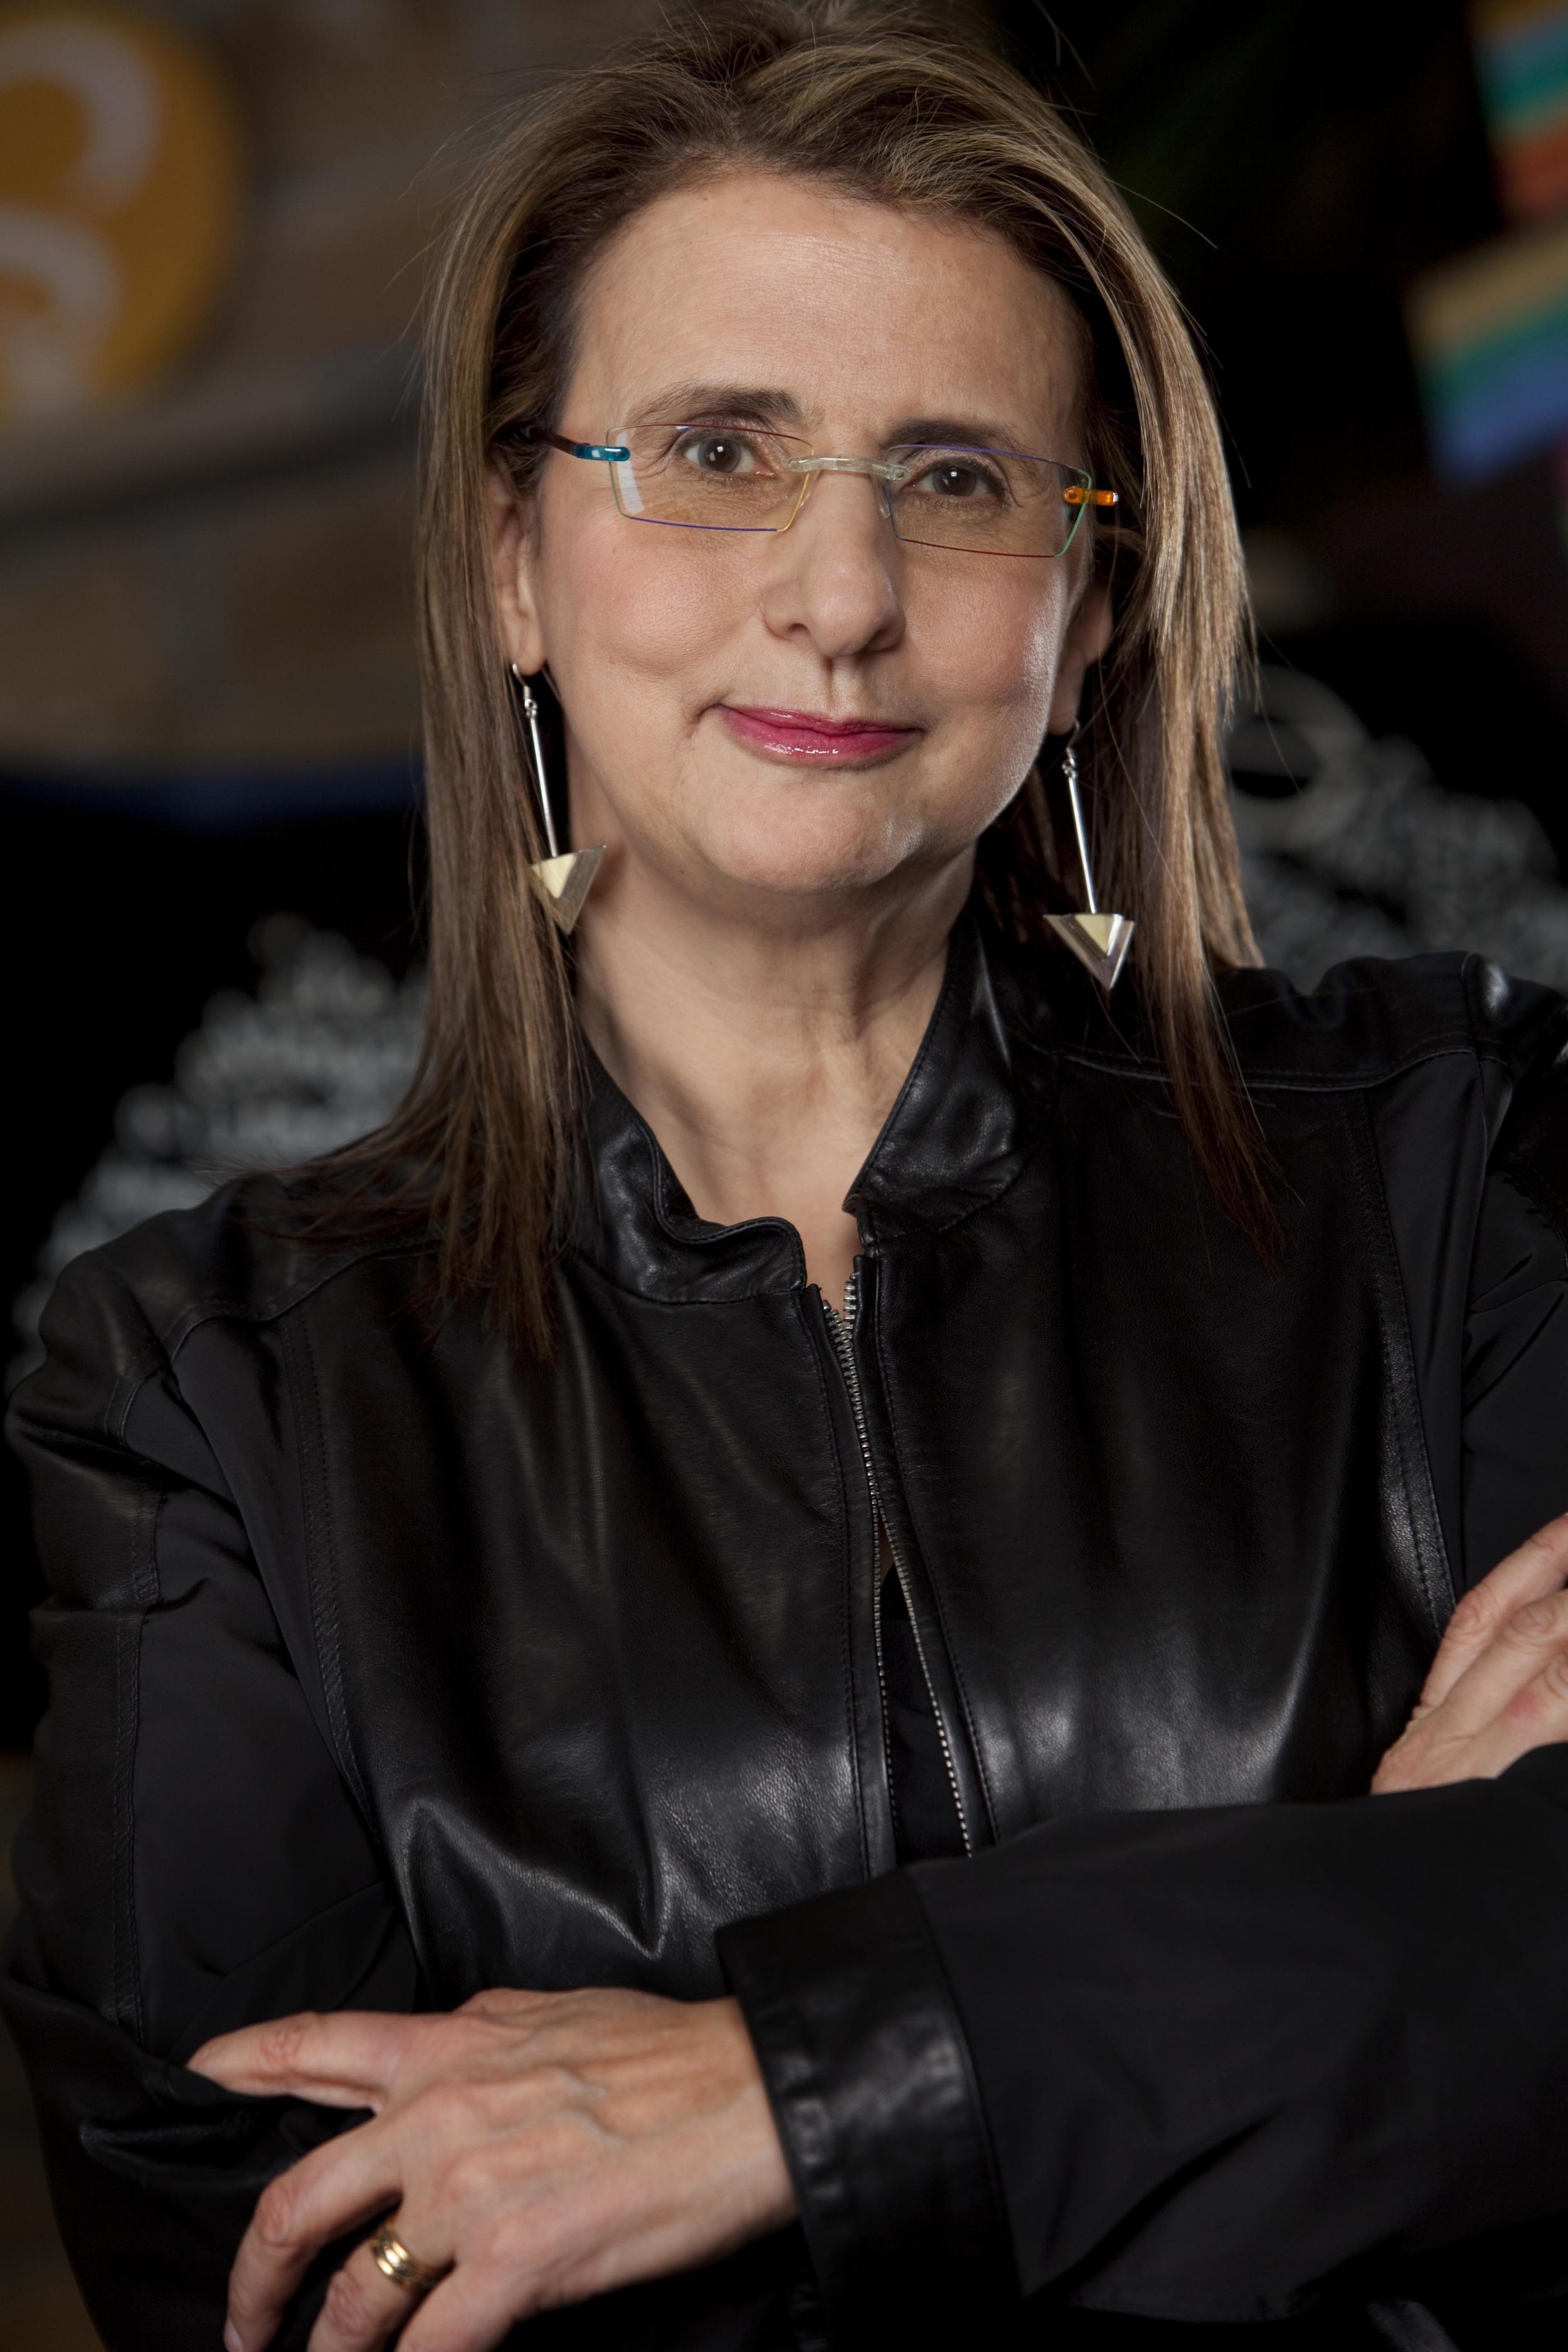 Dominique Raccah